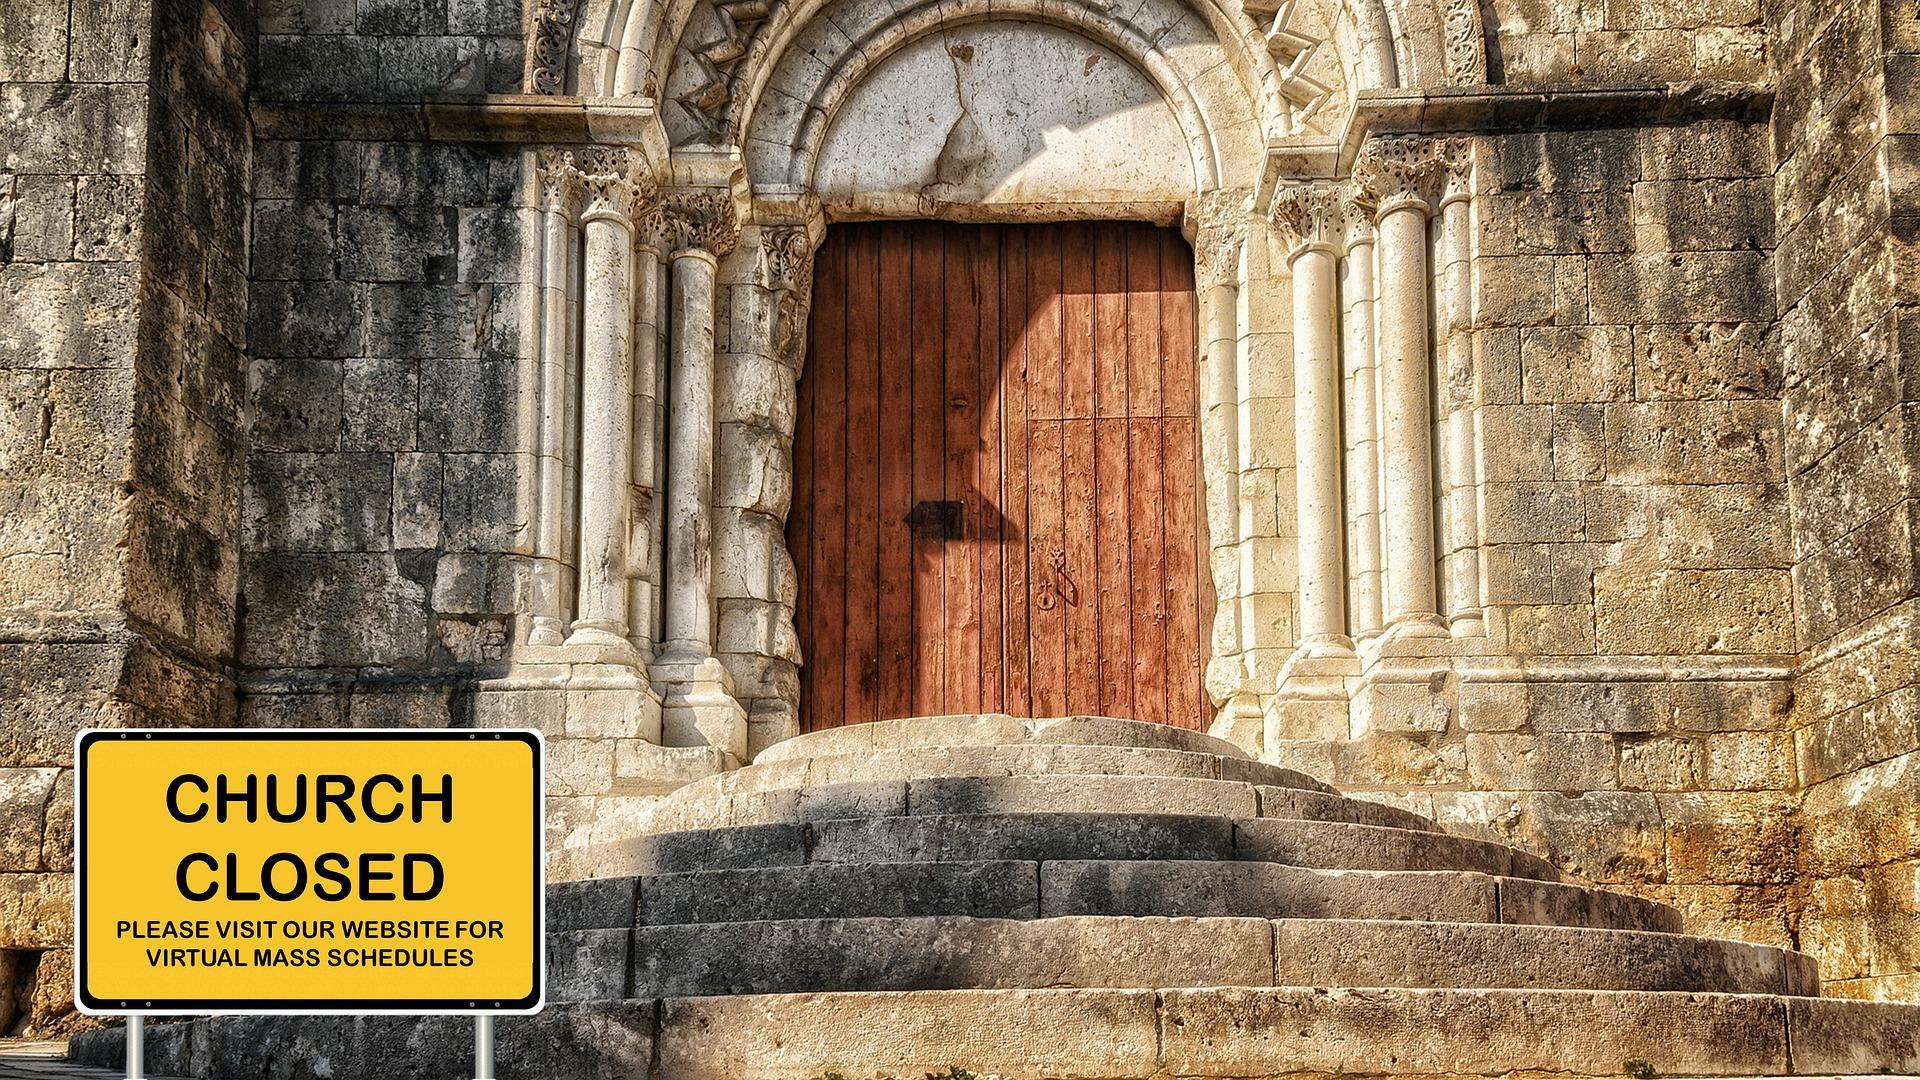 Church_Closed